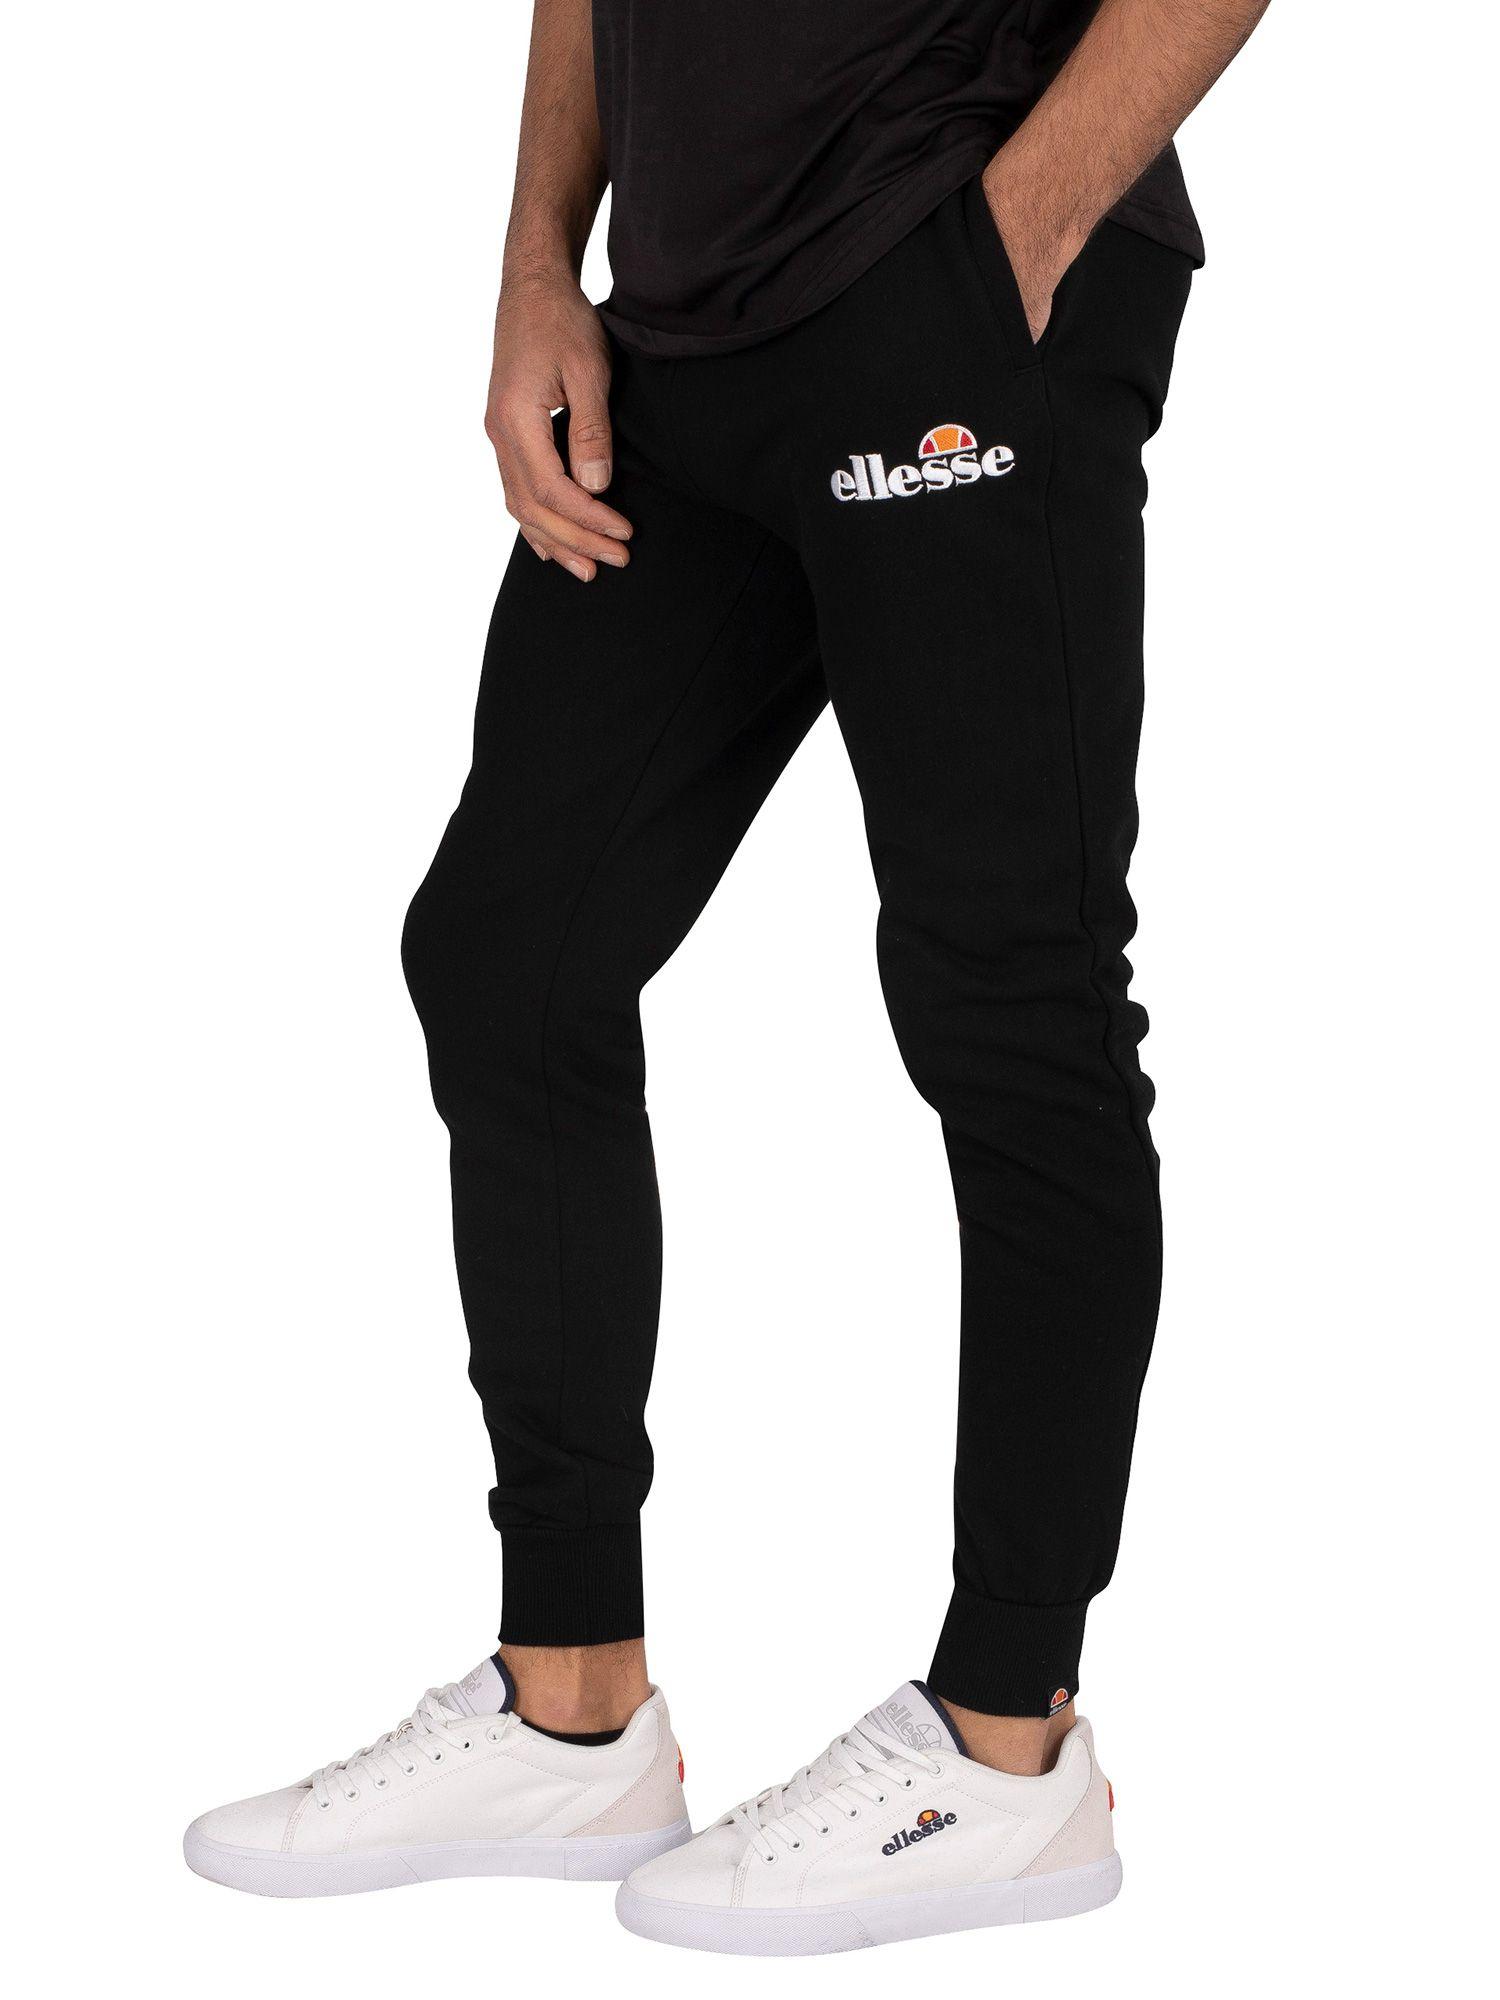 Ellesse Homme Nioro Survêtement Pantalon en Noir //// BNWT ////